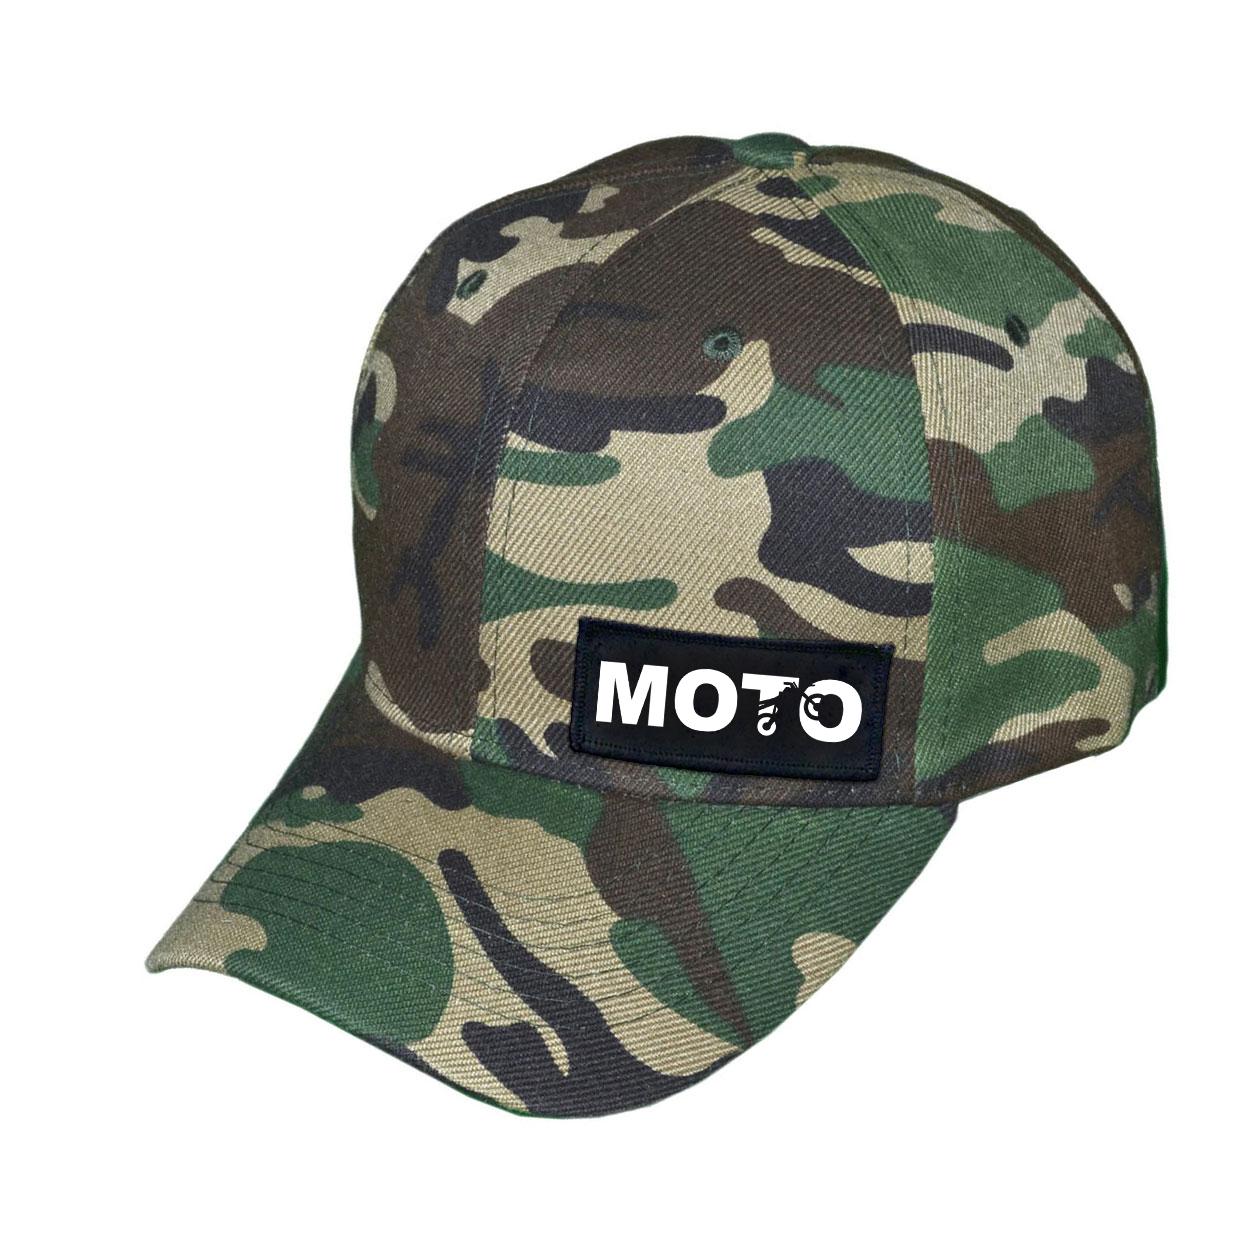 Moto Wheelie Logo Night Out Woven Patch Hat Camo (White Logo)